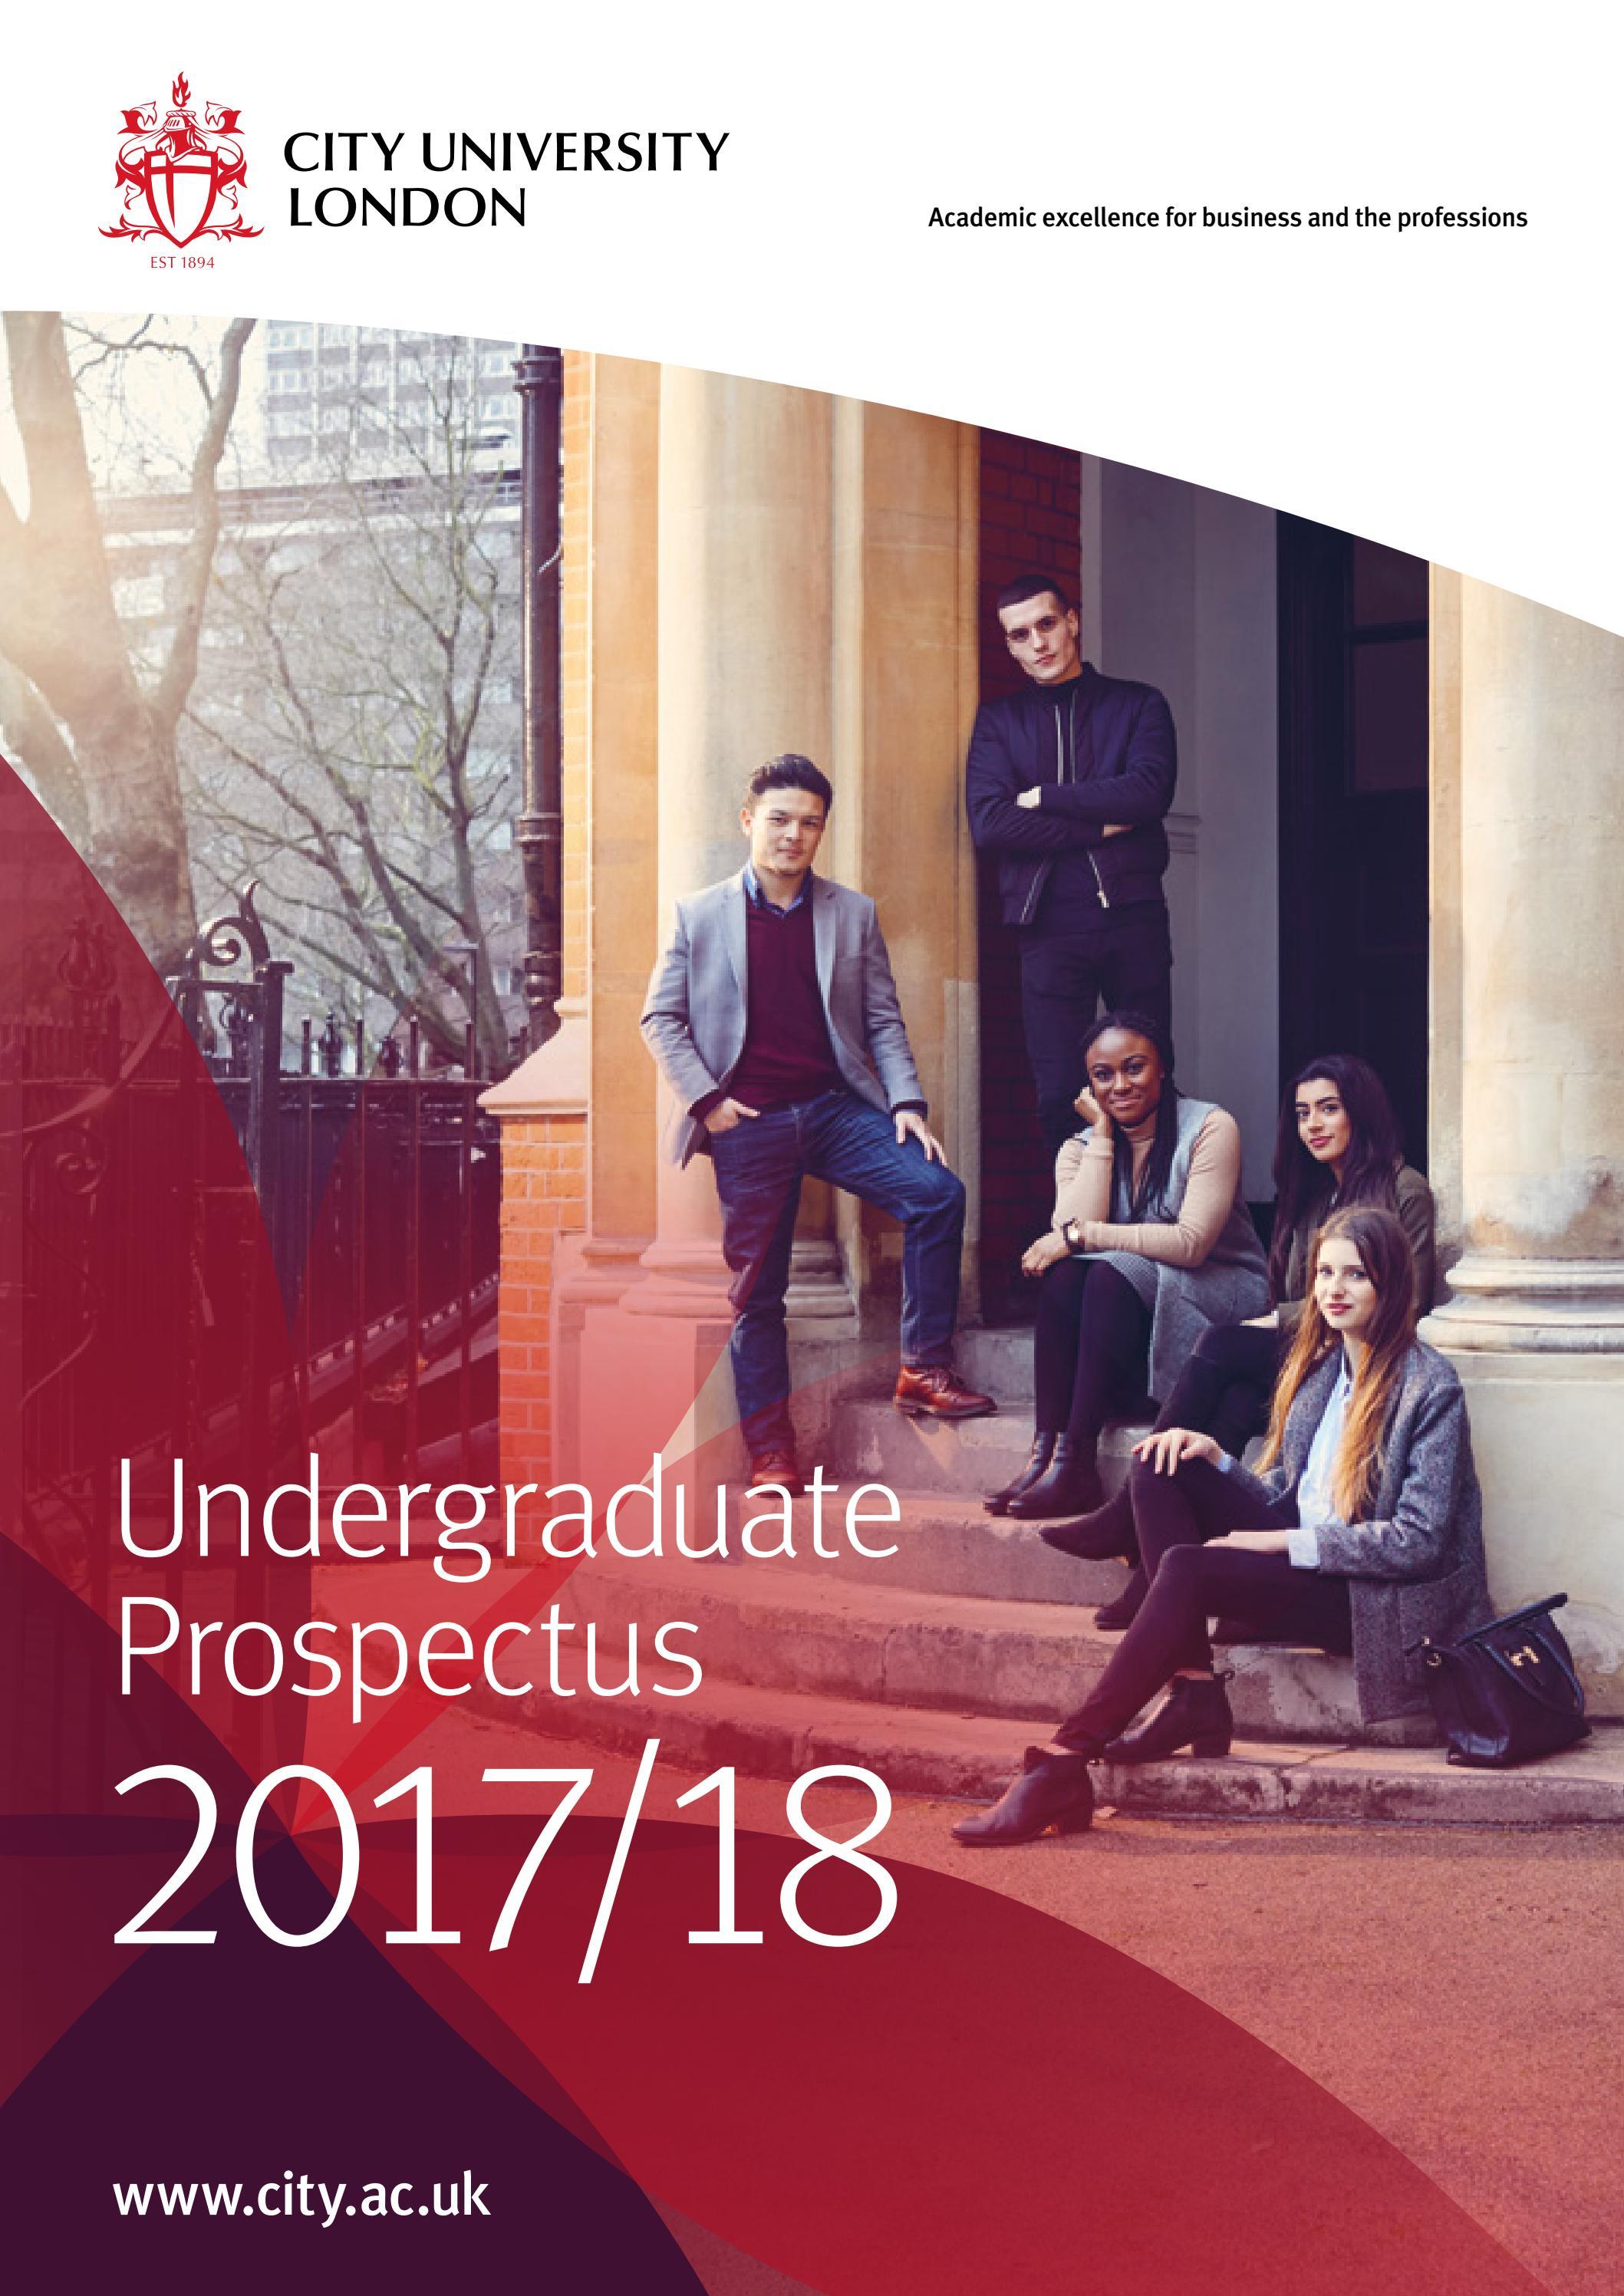 City University London 2017/18 Undergraduate Prospectus by City, University of London - Issuu